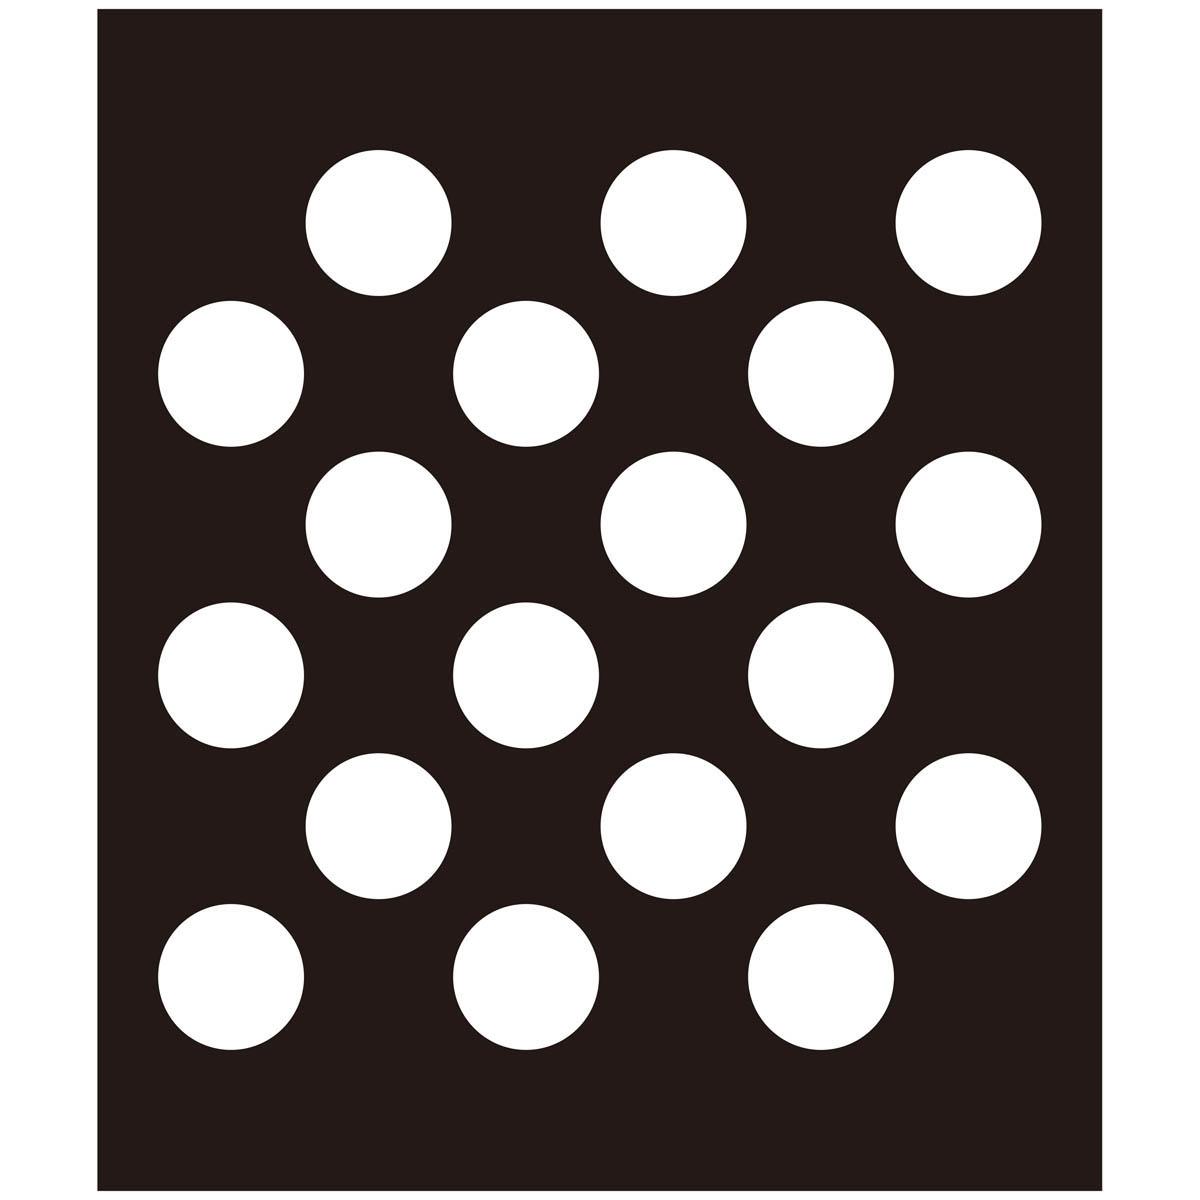 FolkArt ® Painting Stencils - Large - Polka Dot